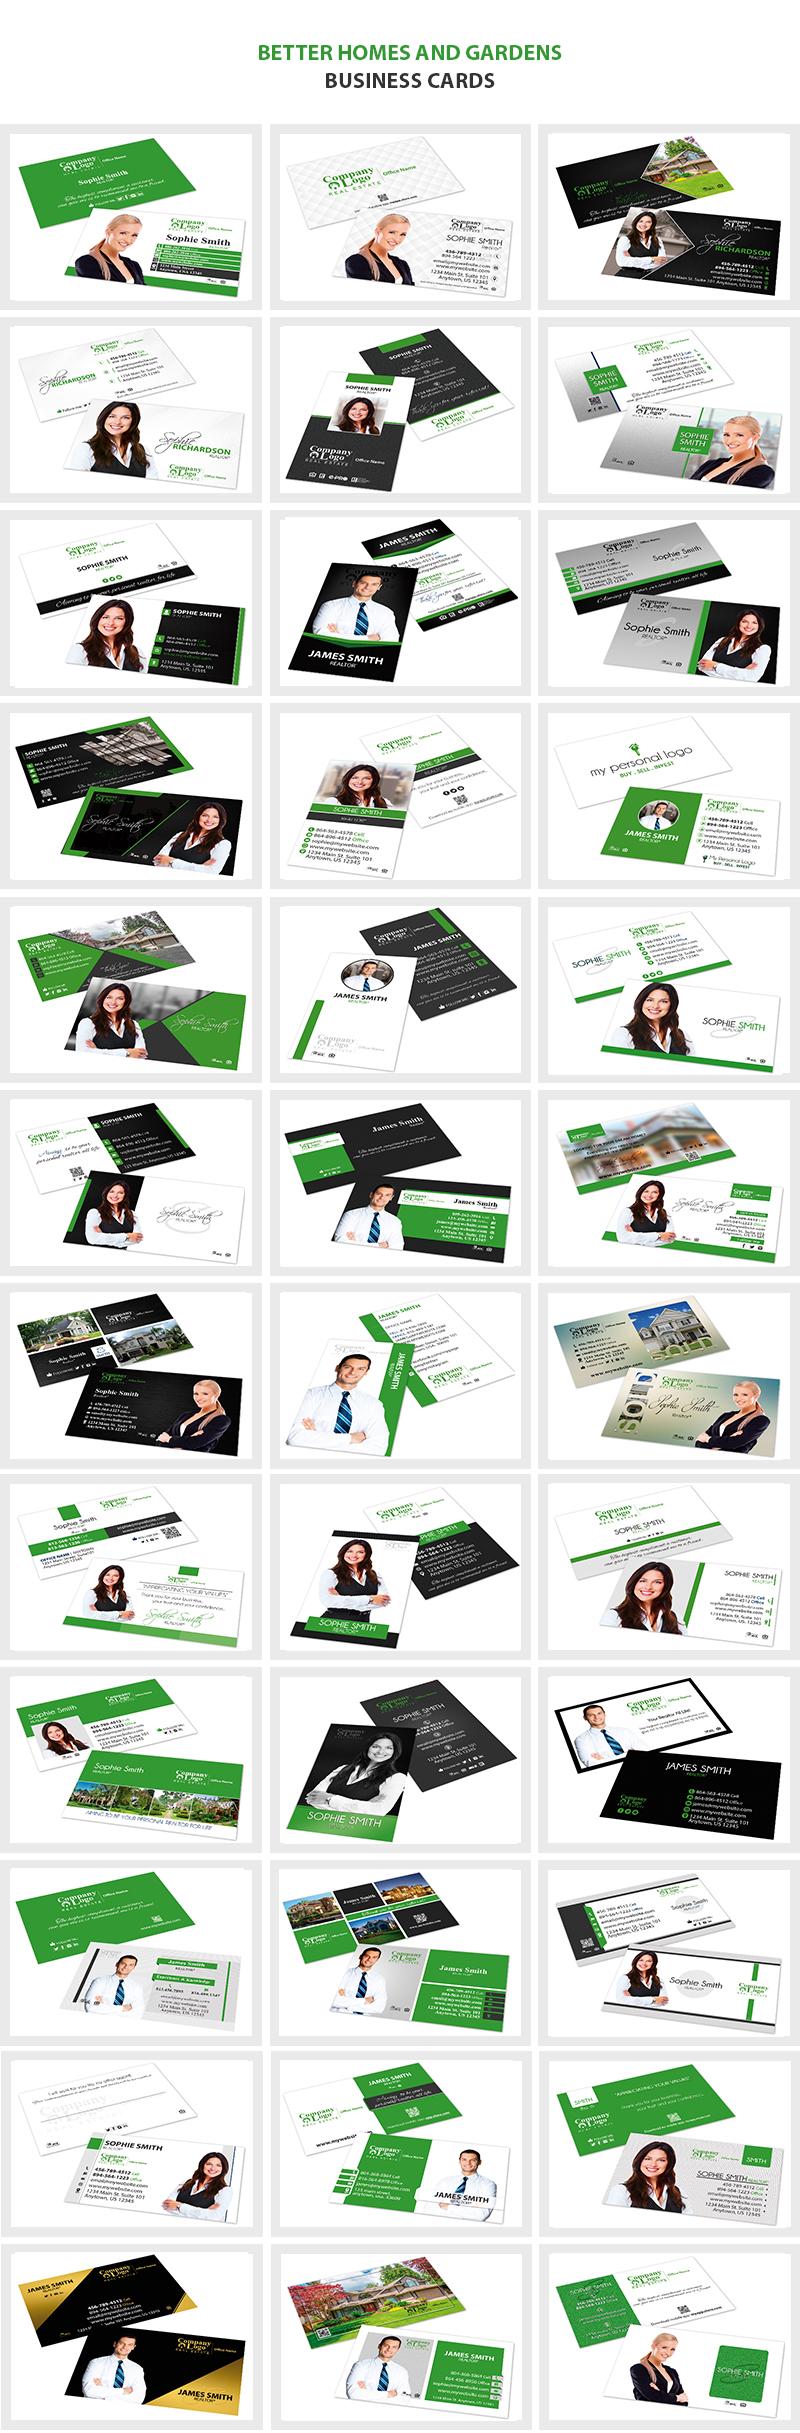 Better Homes Gardens Business Cards, Better Homes Gardens Realtor Business Cards, Better Homes Gardens Broker Business Cards, Better Homes Gardens Agent Business Cards, Better Homes Gardens Office Business Cards